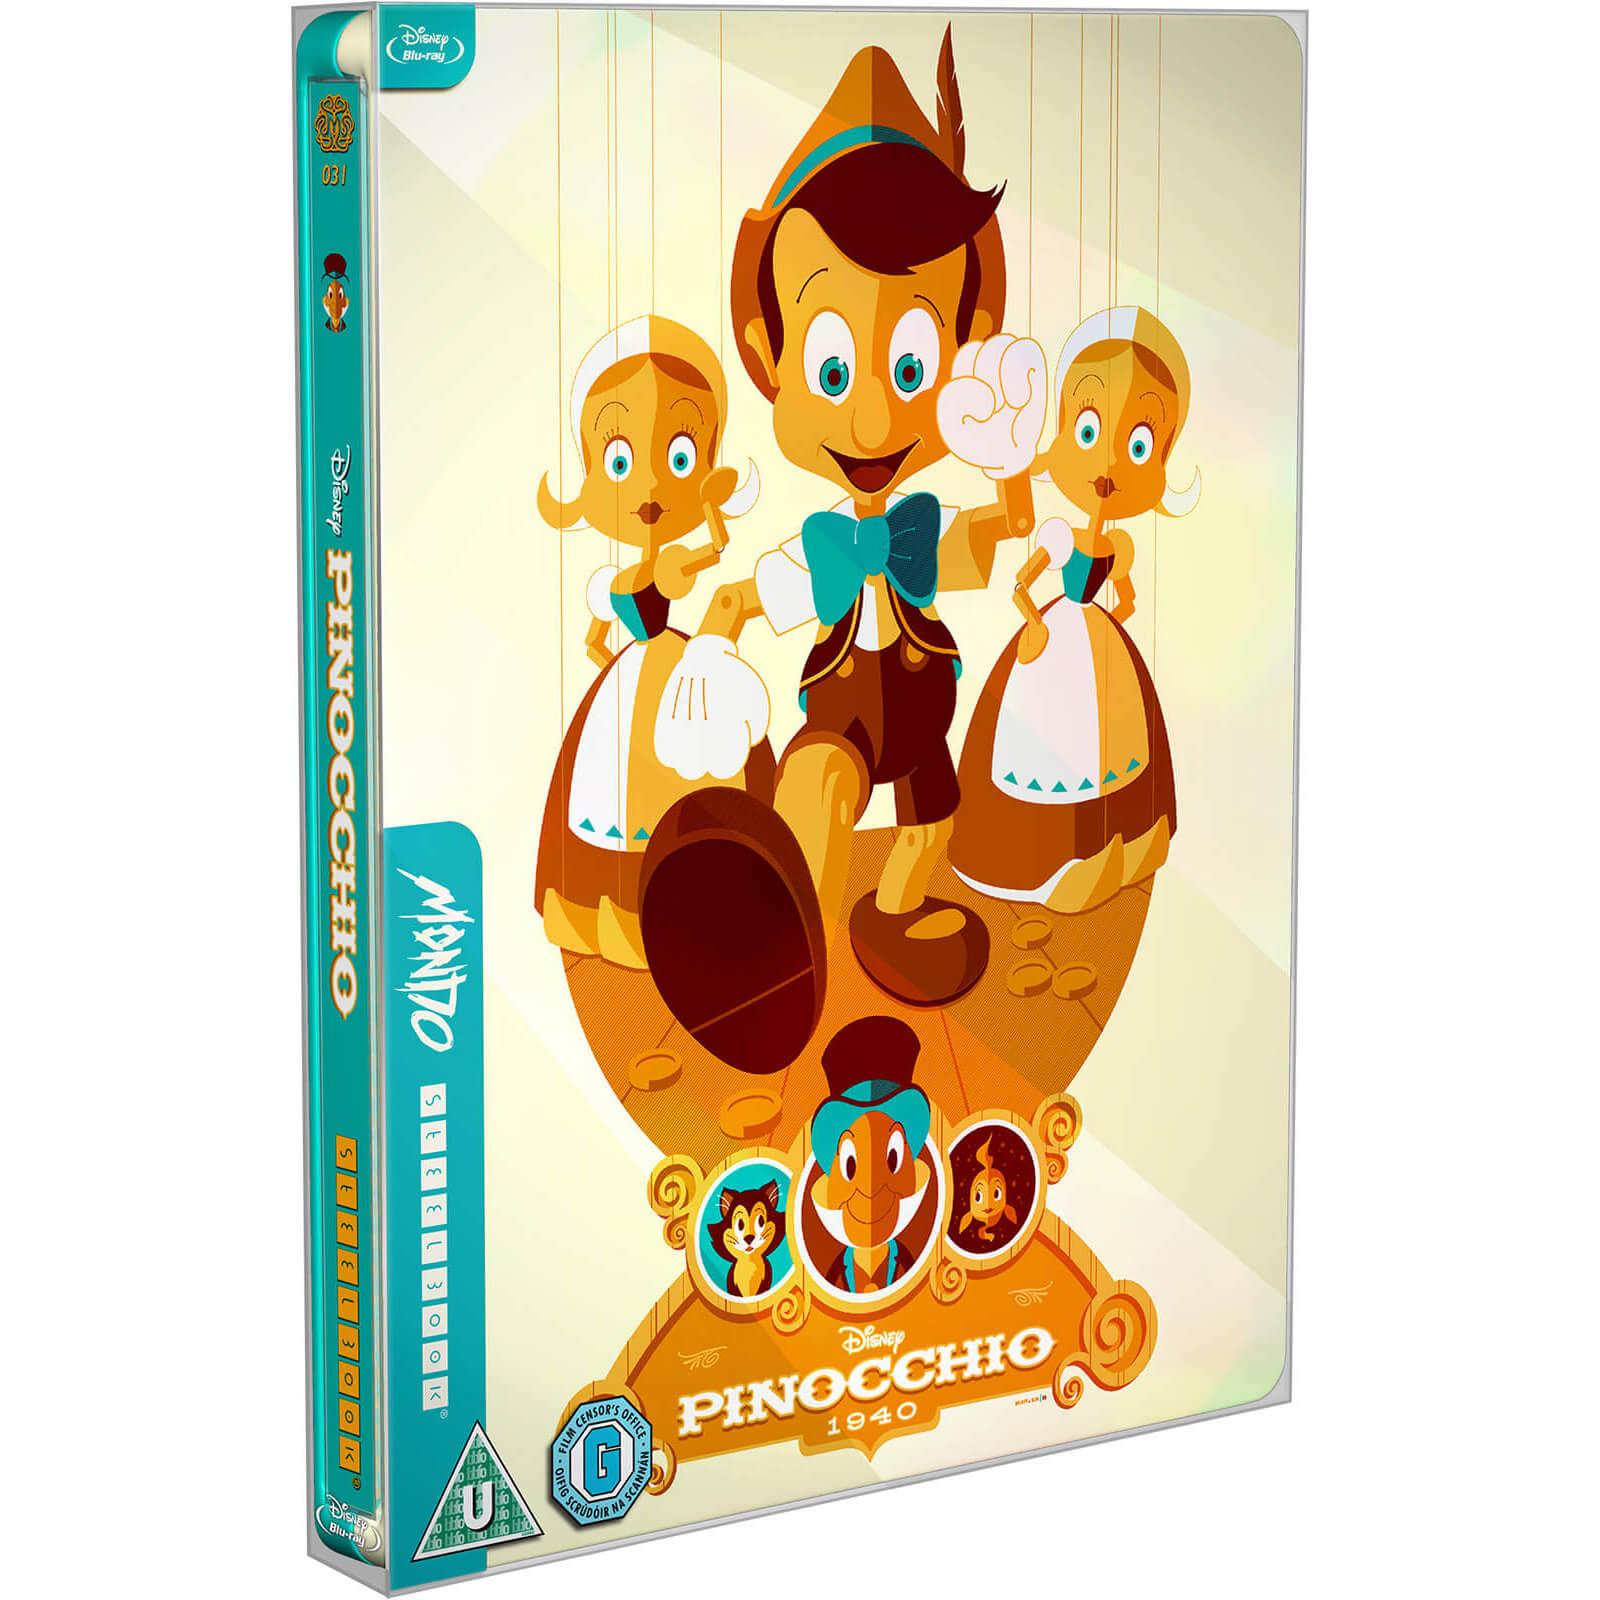 Disney's Pinocchio Limited Edition Steelbook (Blu-ray) £8.99 delivered using code @ Zavvi